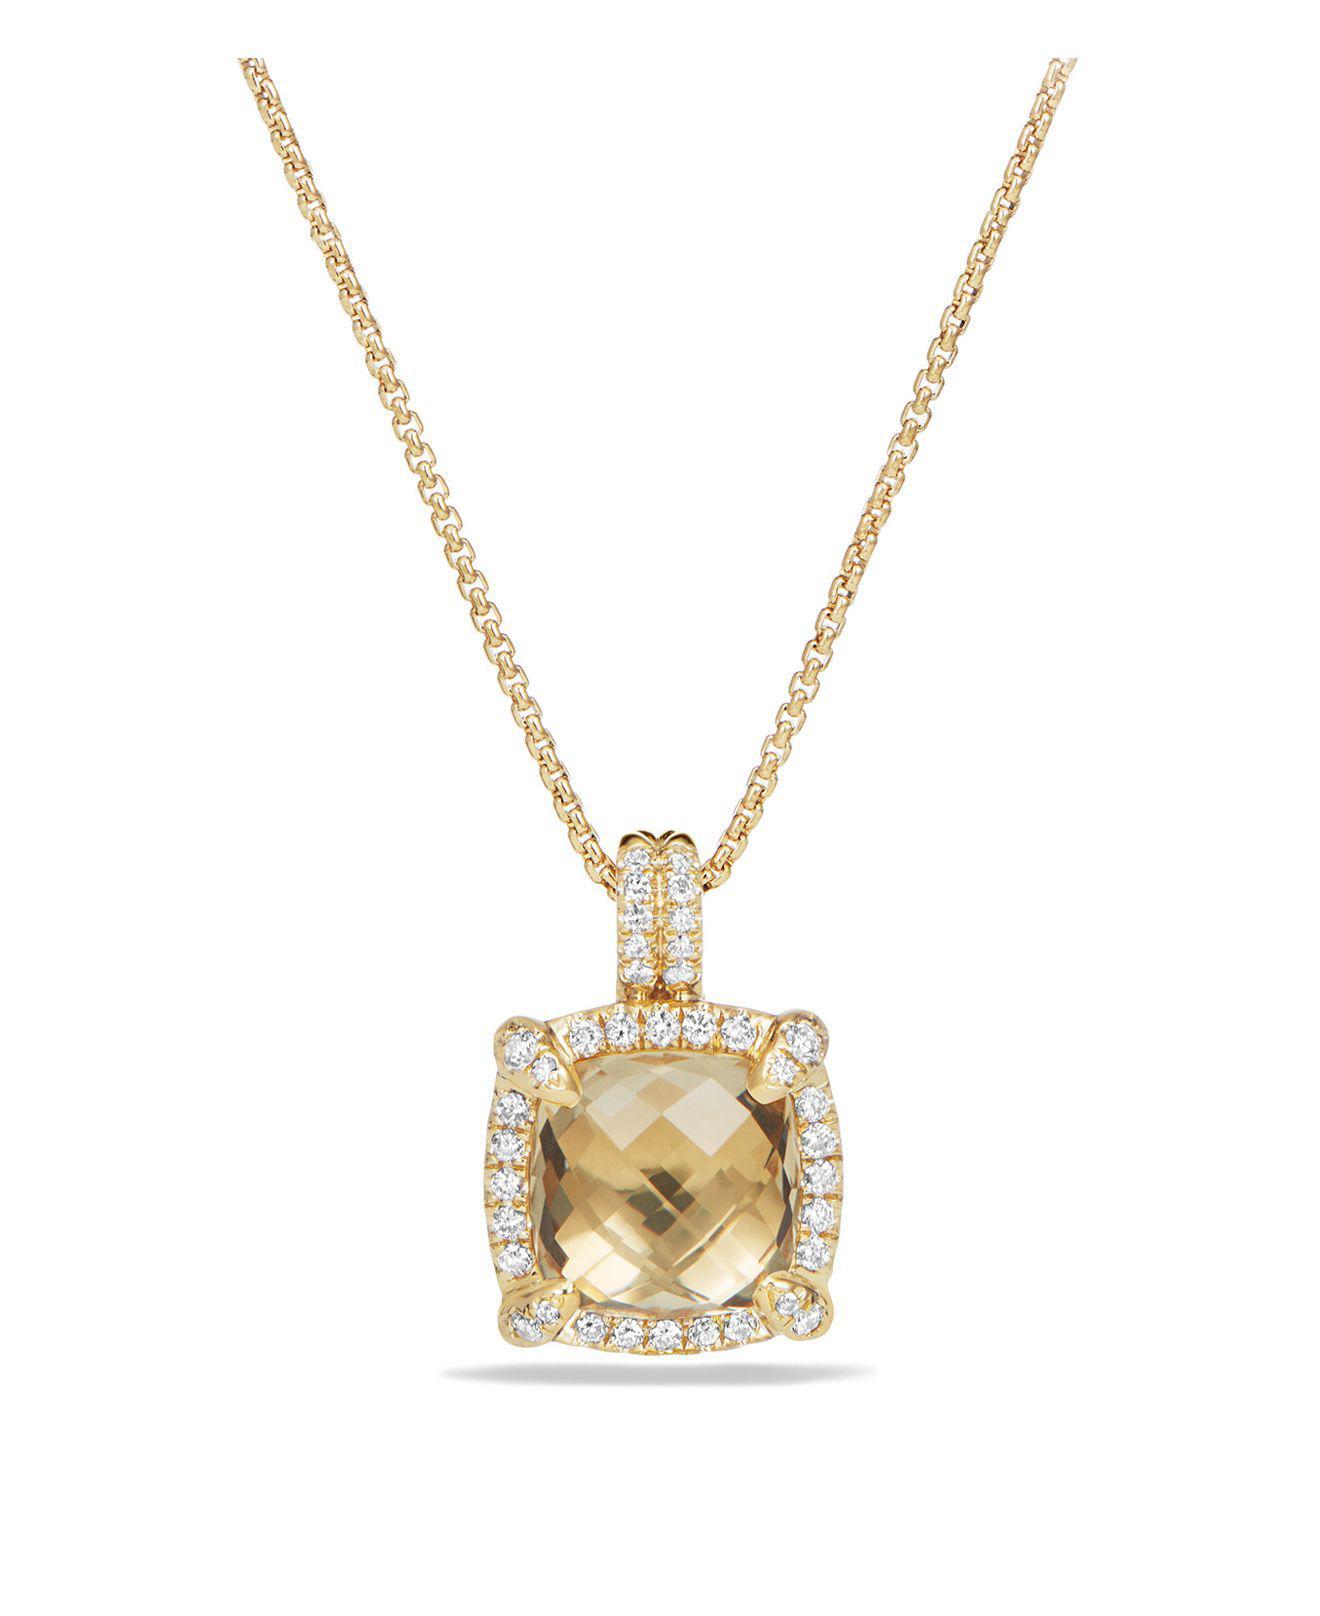 David Yurman 18kt yellow gold Châtelaine turquoise and diamond pendant necklace - Metallic dJox2Vt